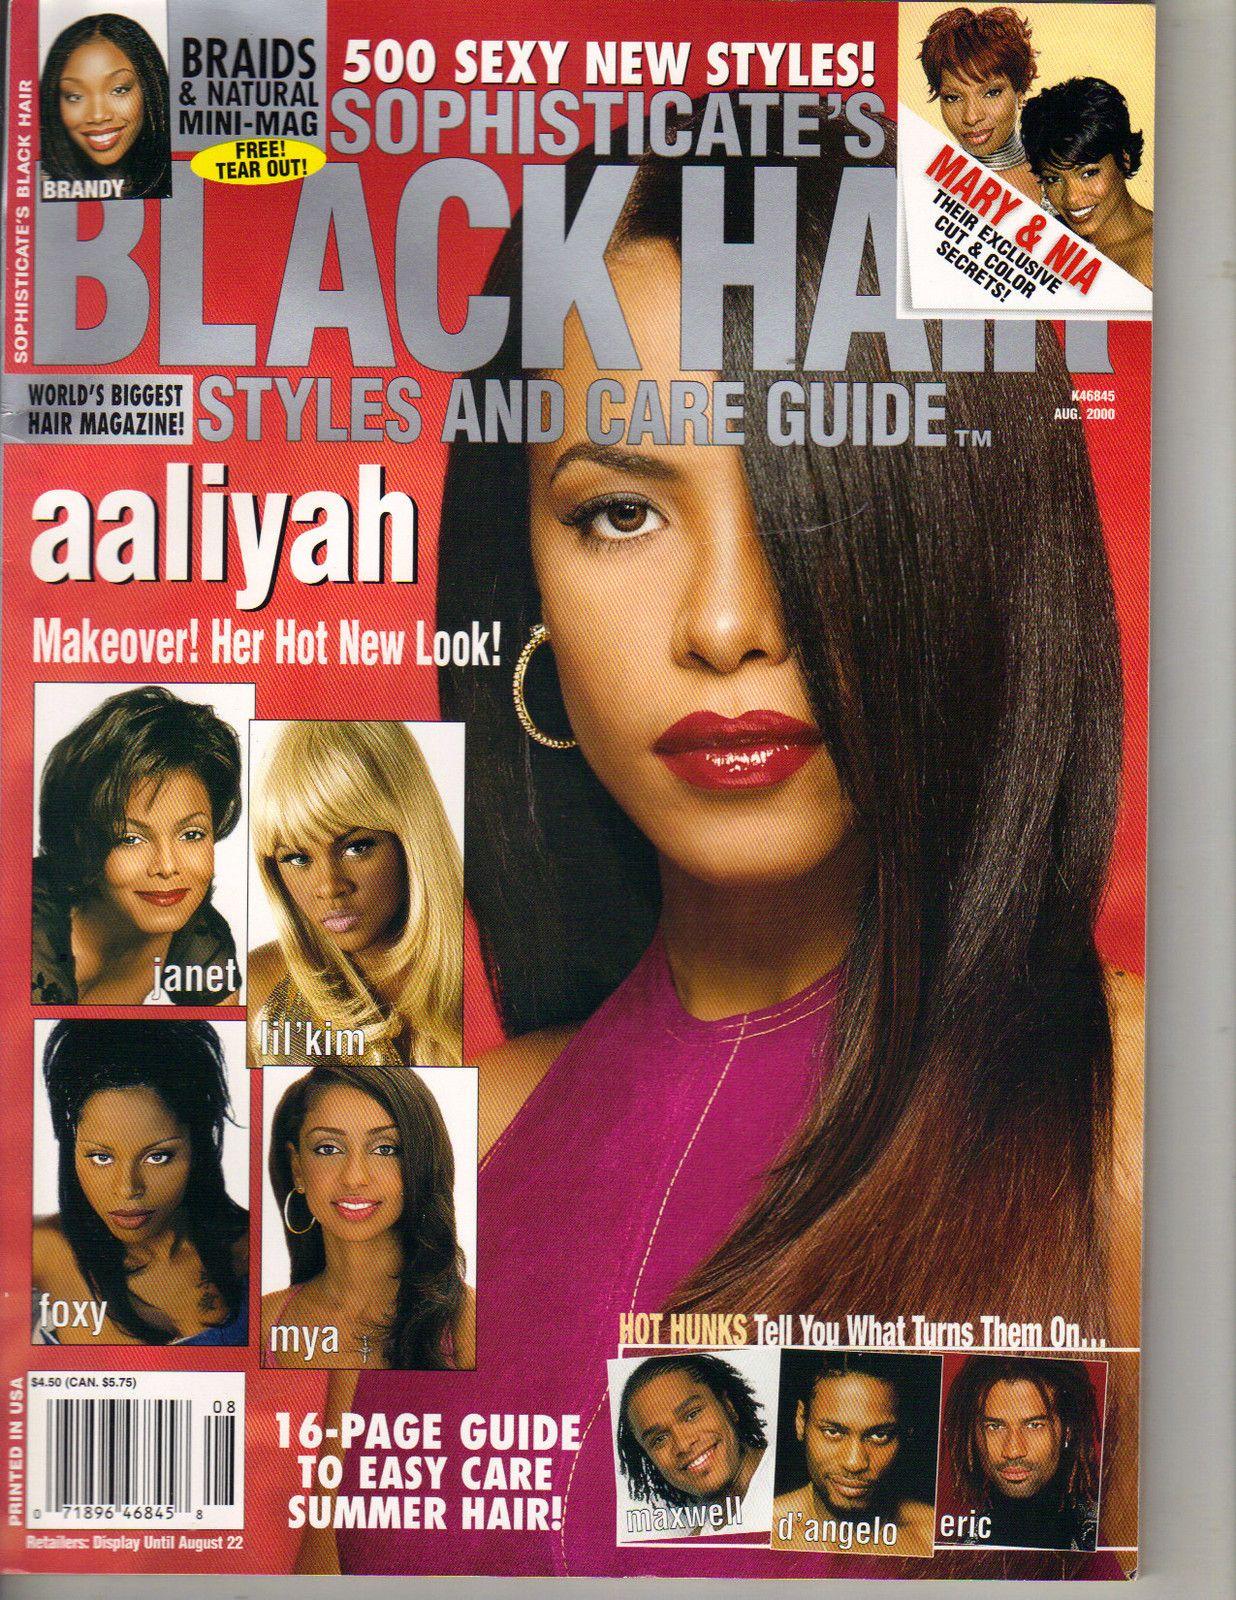 Резултат слика за black hair magazinea from the 90s